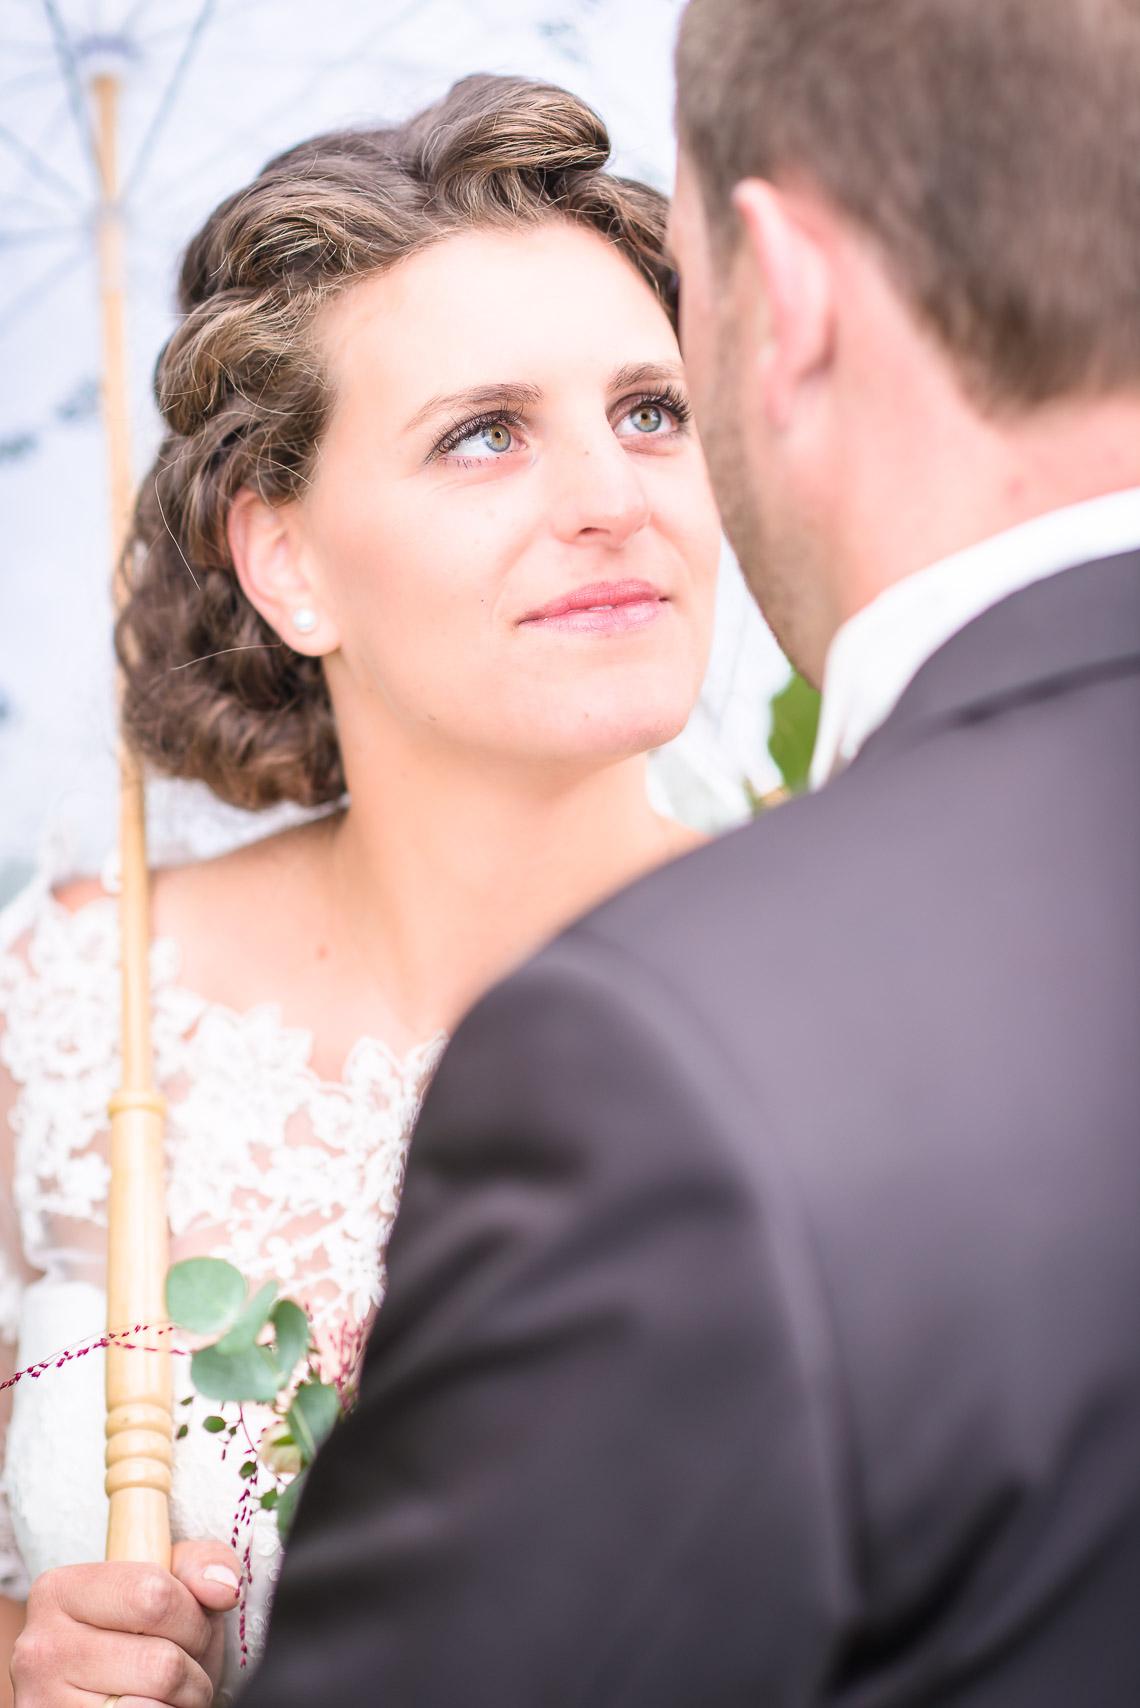 0060_20150905_CKE_4198_Hochzeit_Michaela_Andreas_